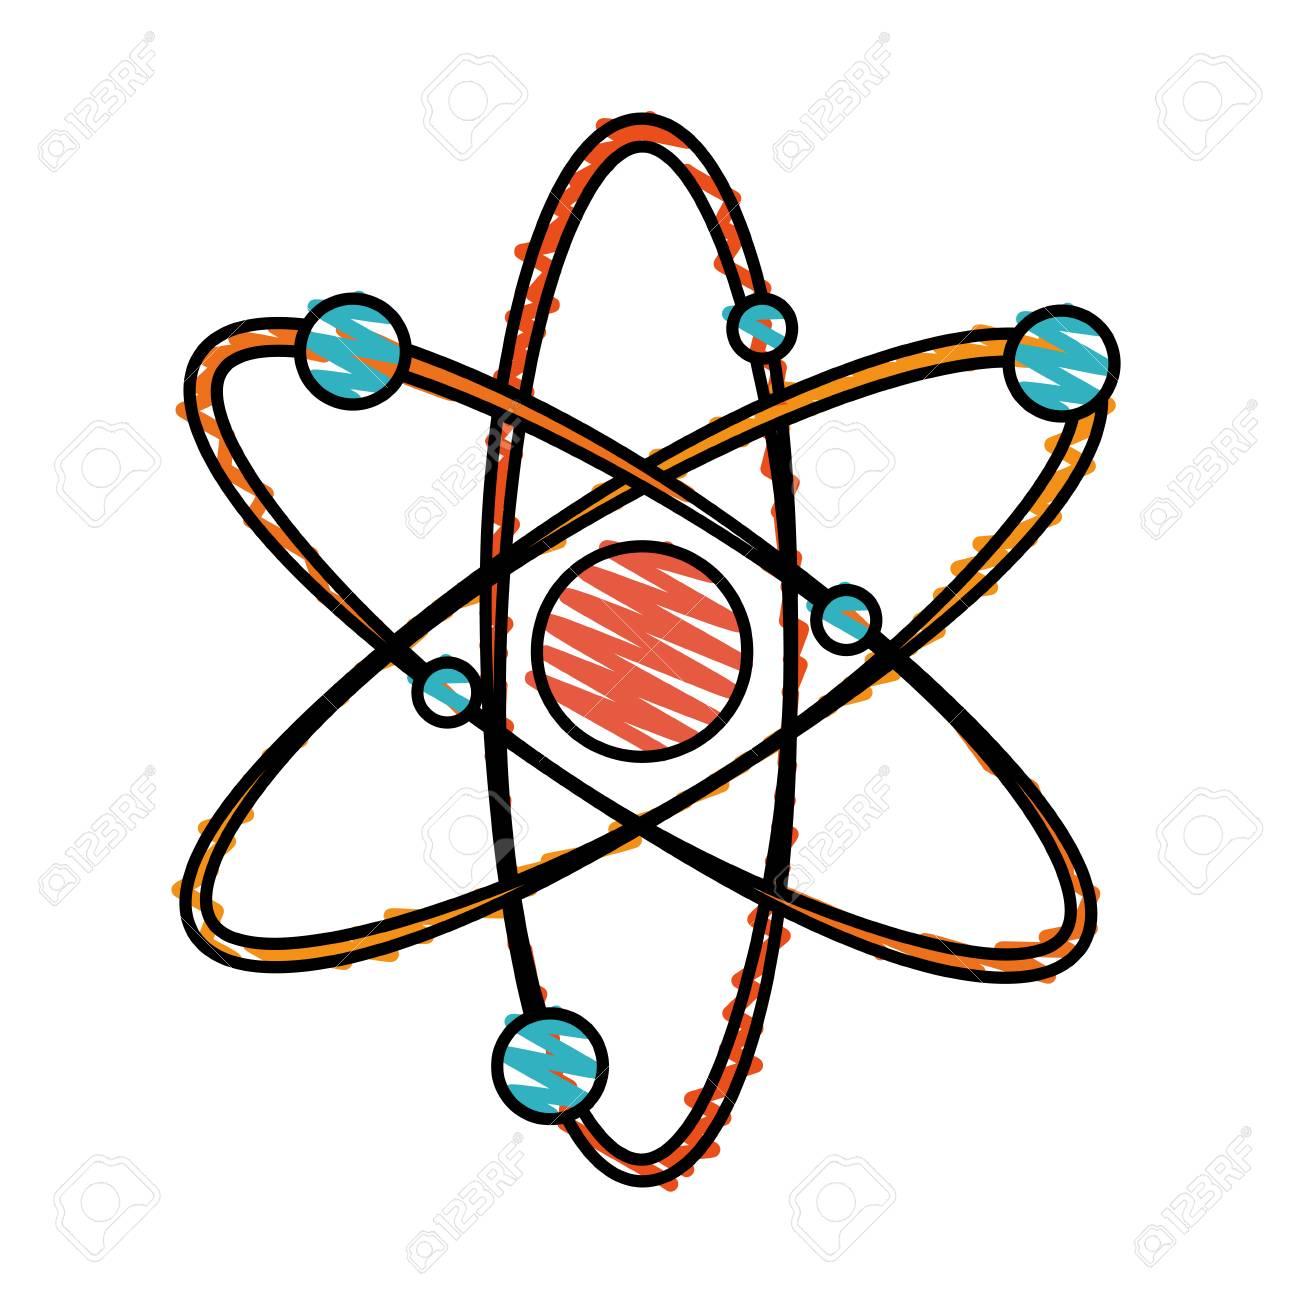 Atom clipart colorful. Vector illustration portal